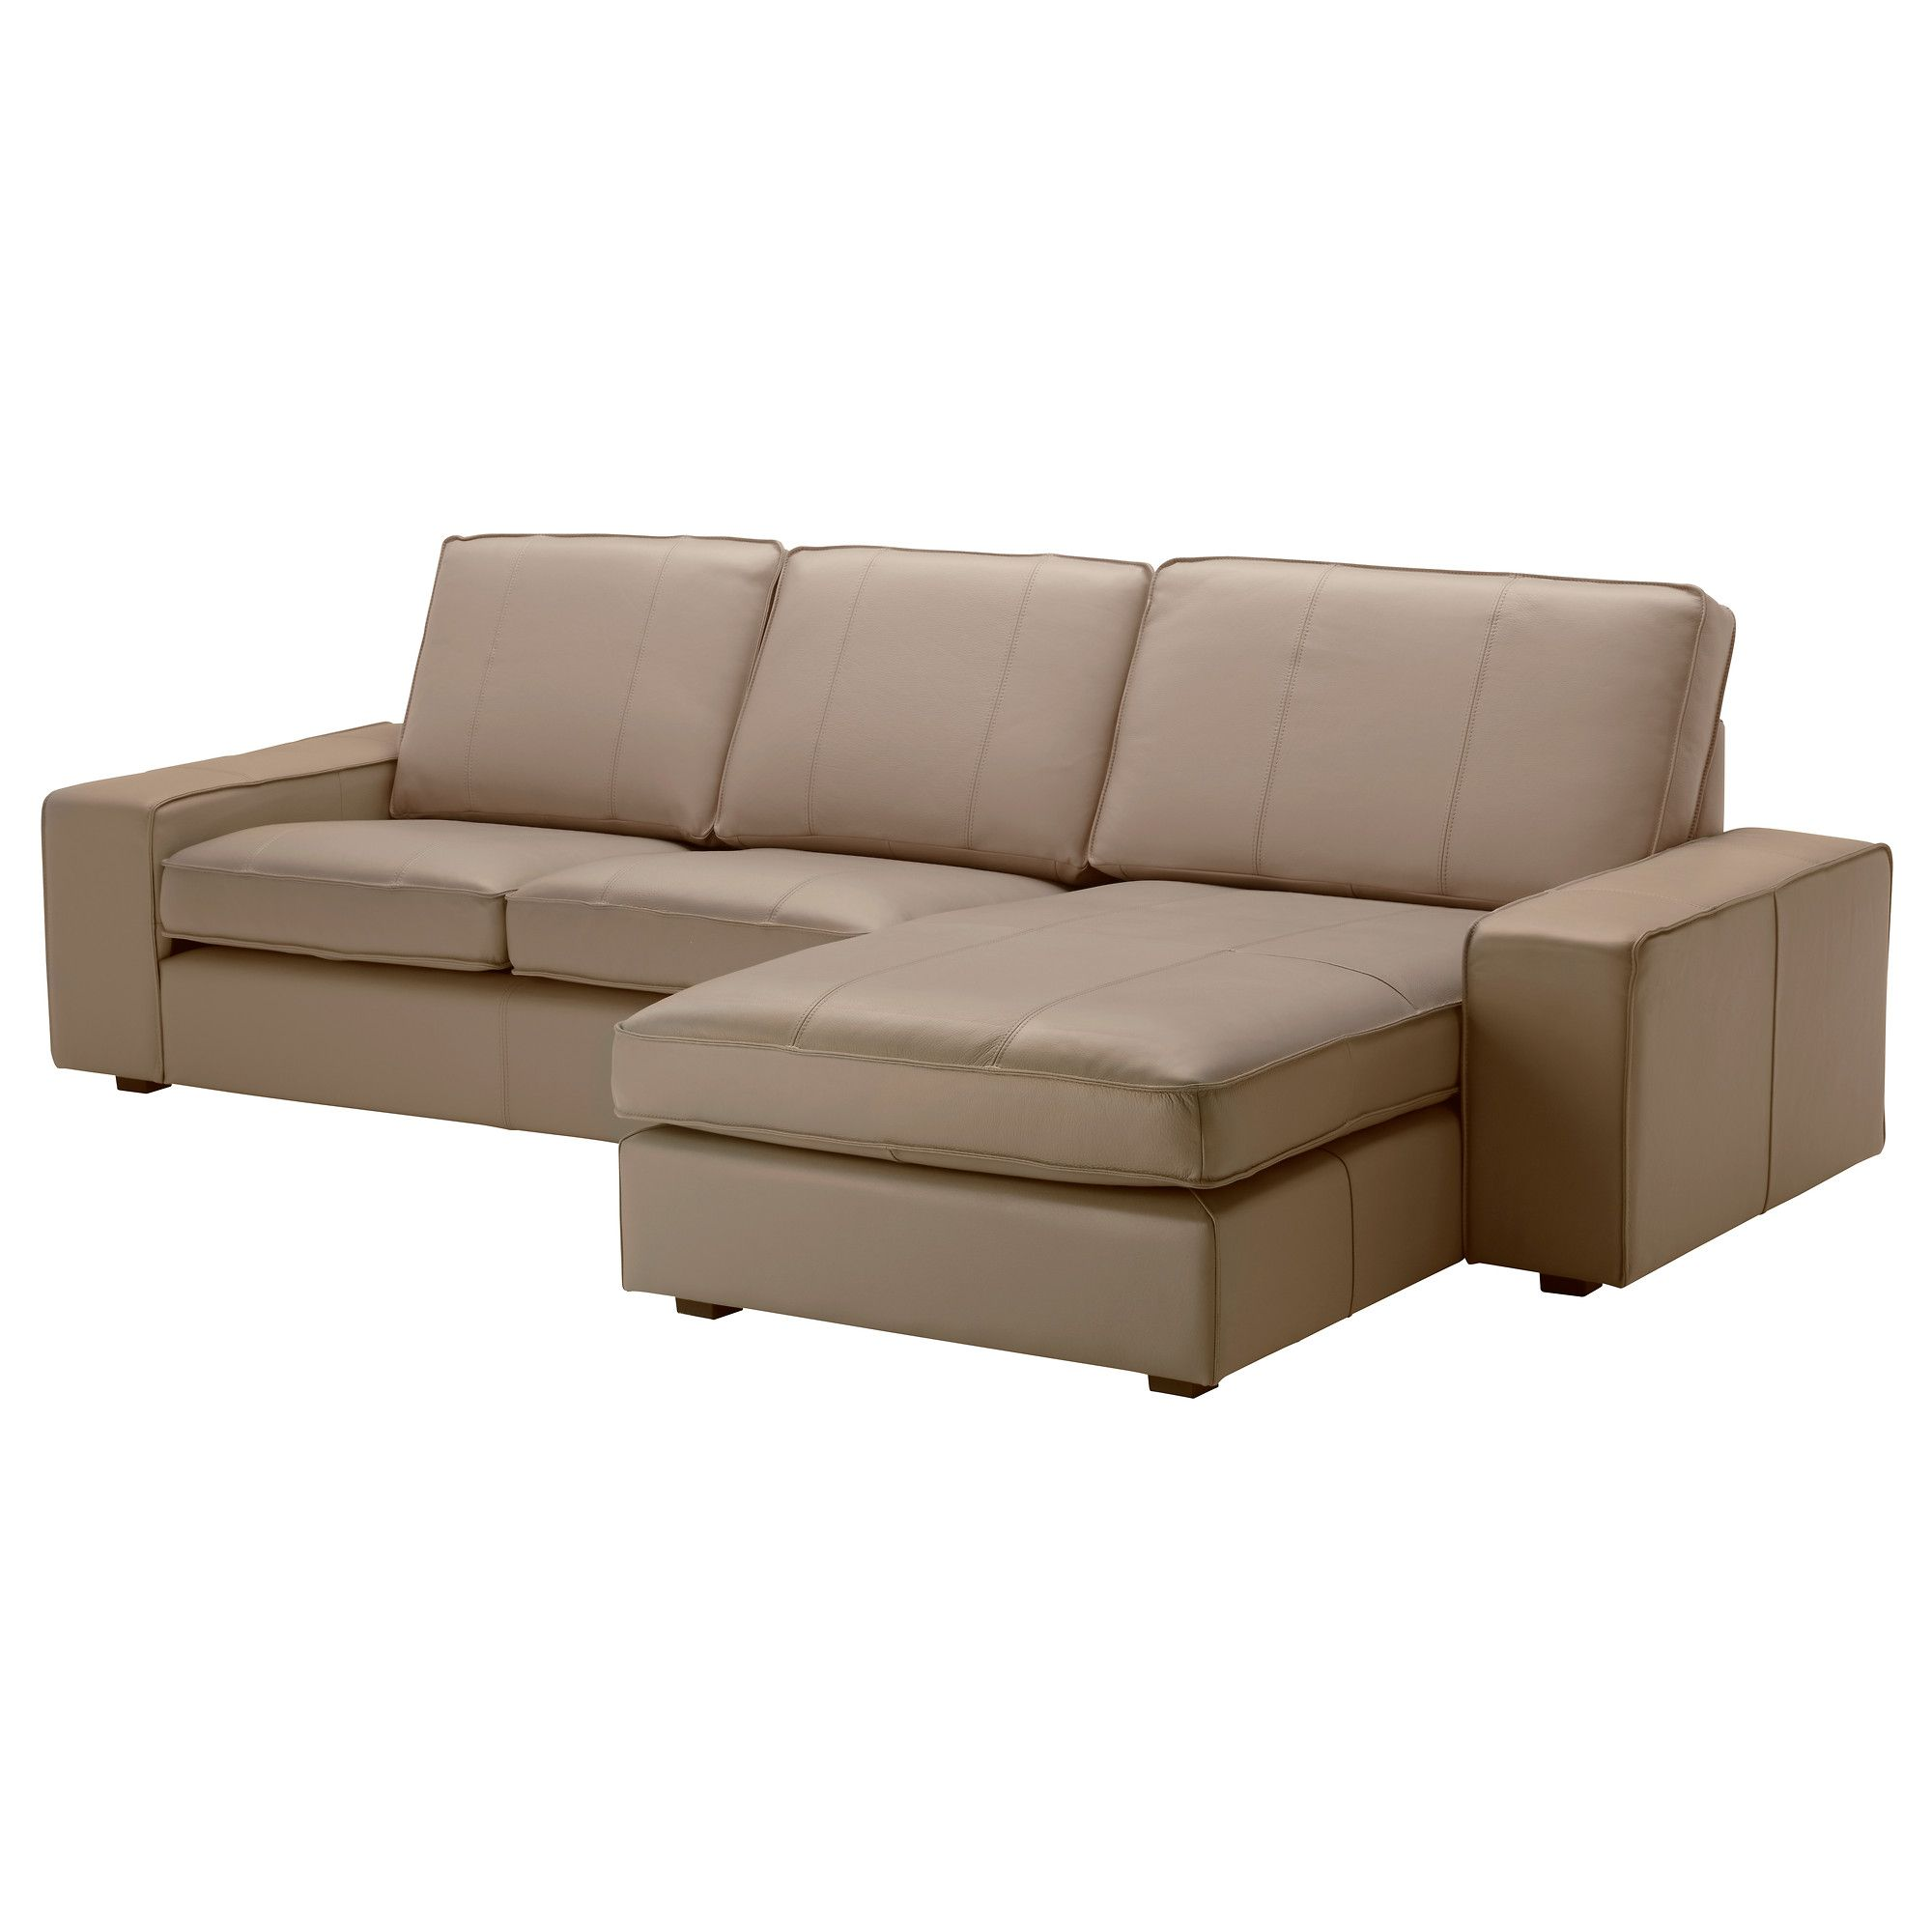 Furniture and Home Furnishings | Home | Modern leather sofa ...